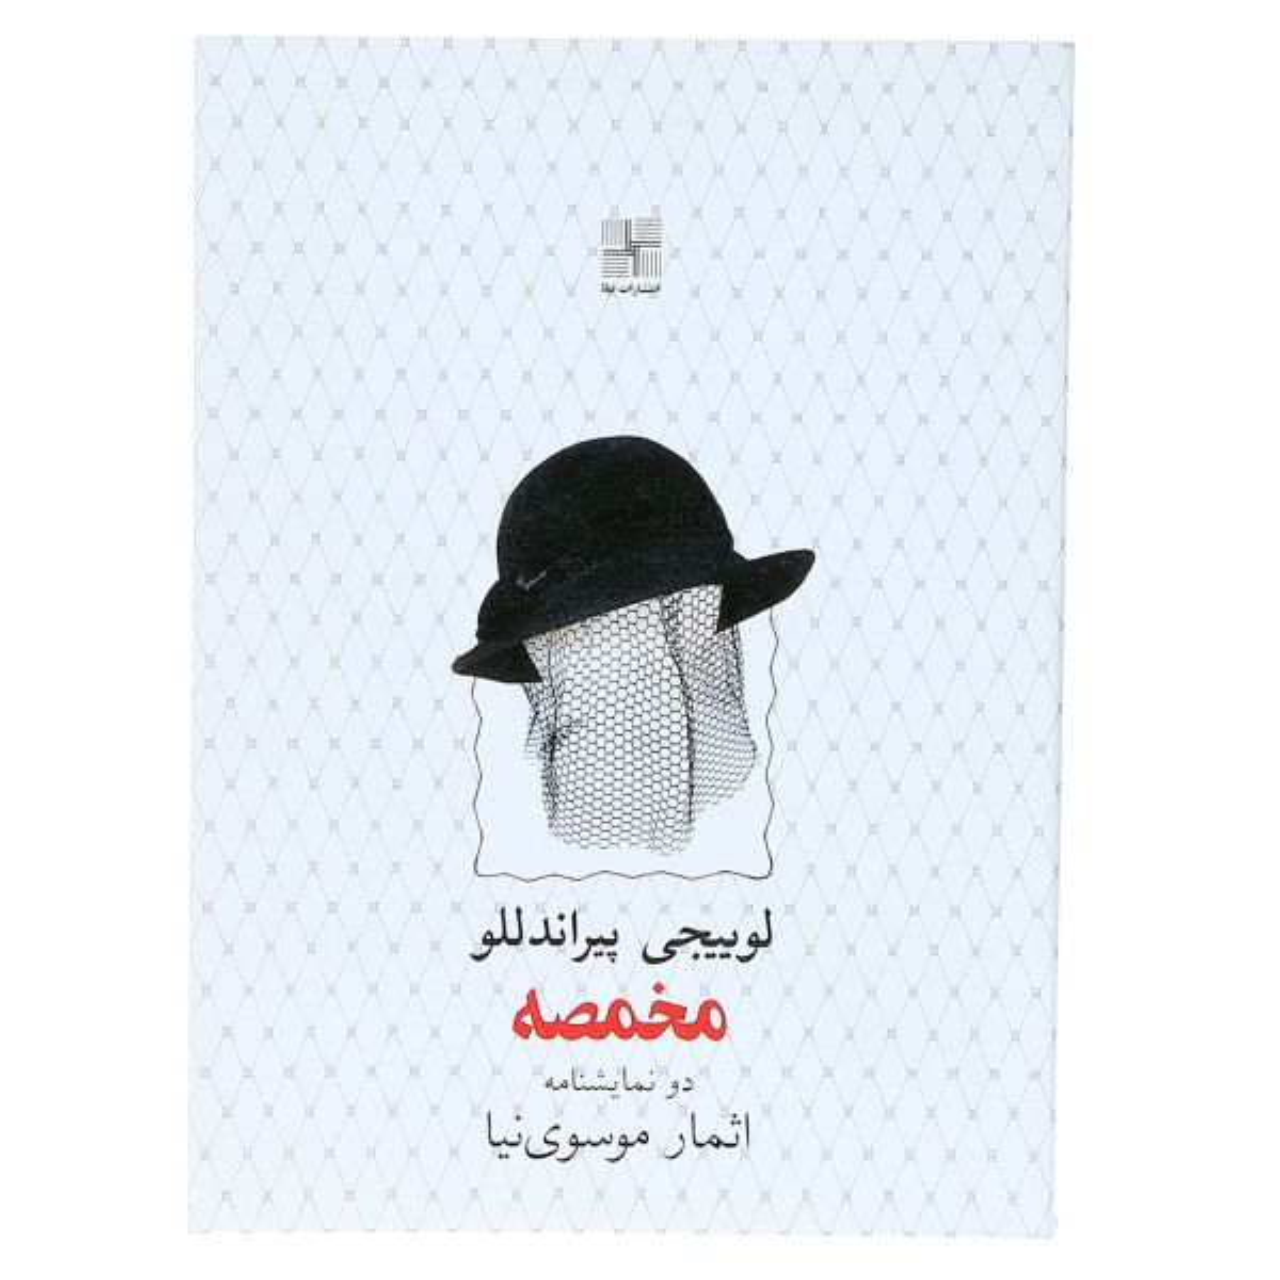 کتاب مخمصه اثر لوییجی پیراندلو